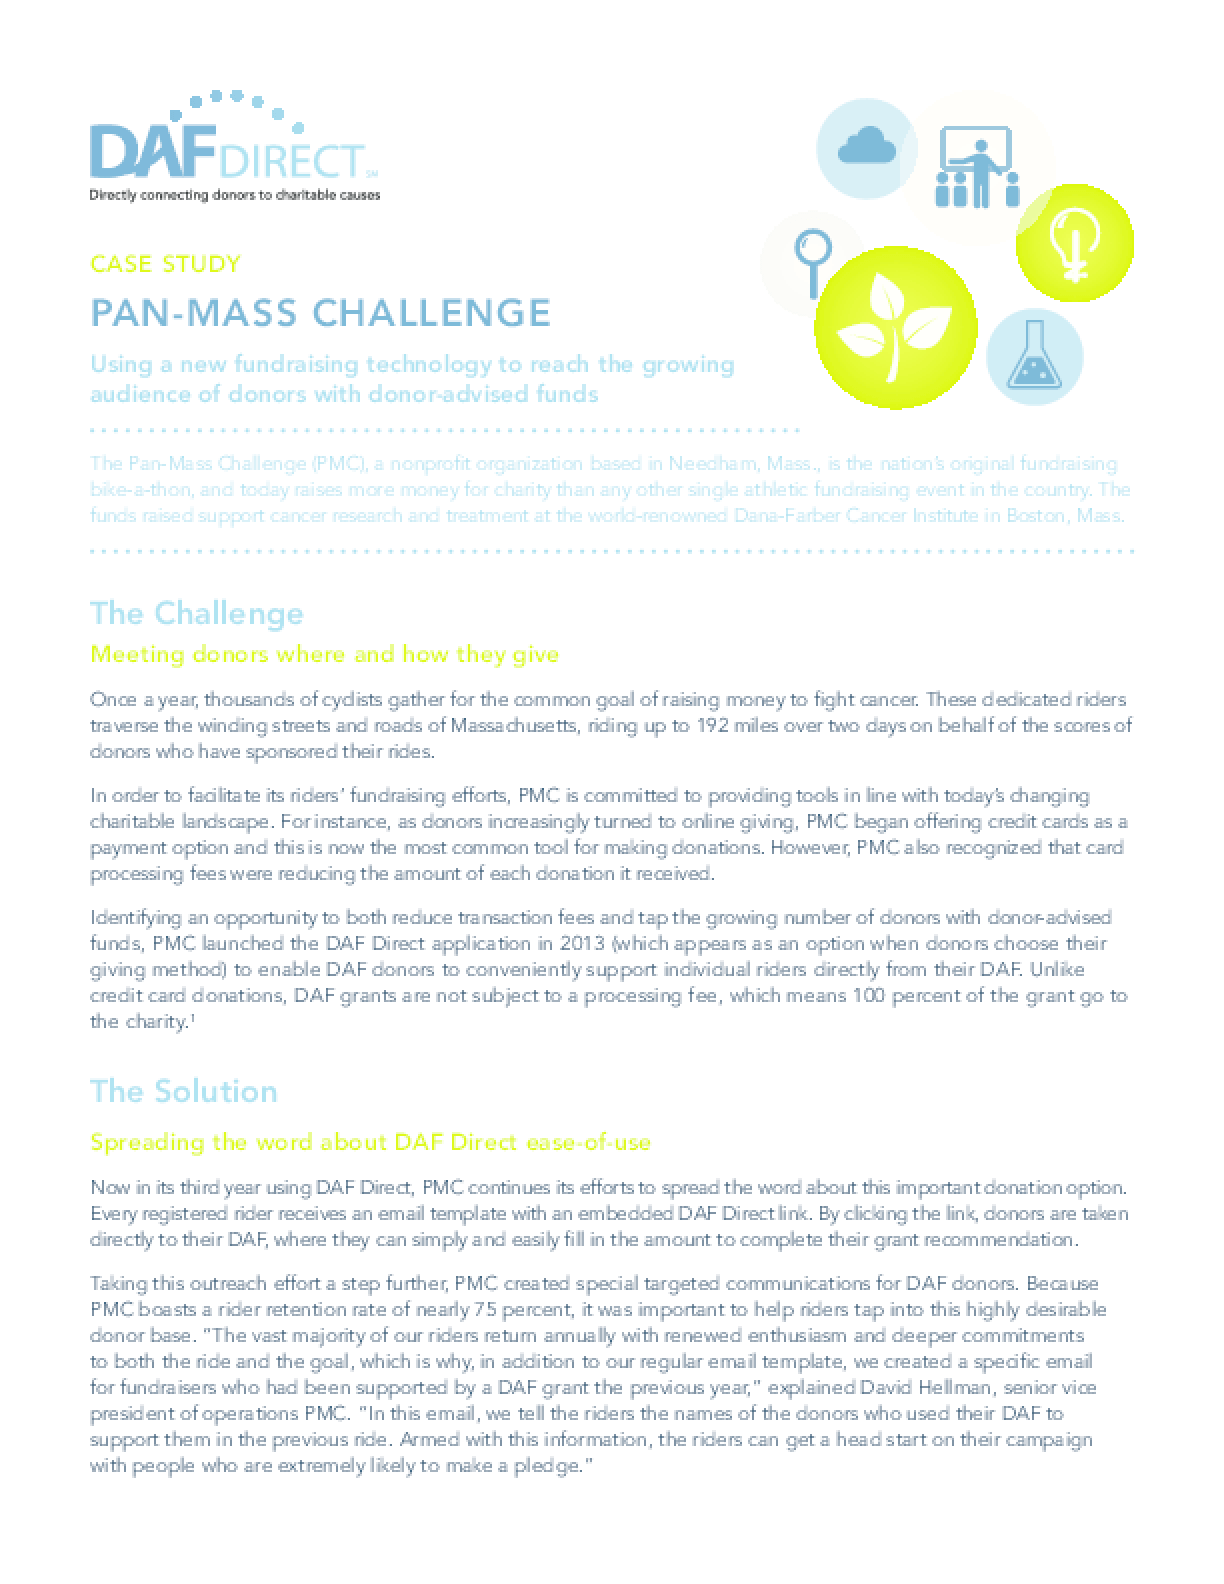 Case Study: Pan-Mass Challenge